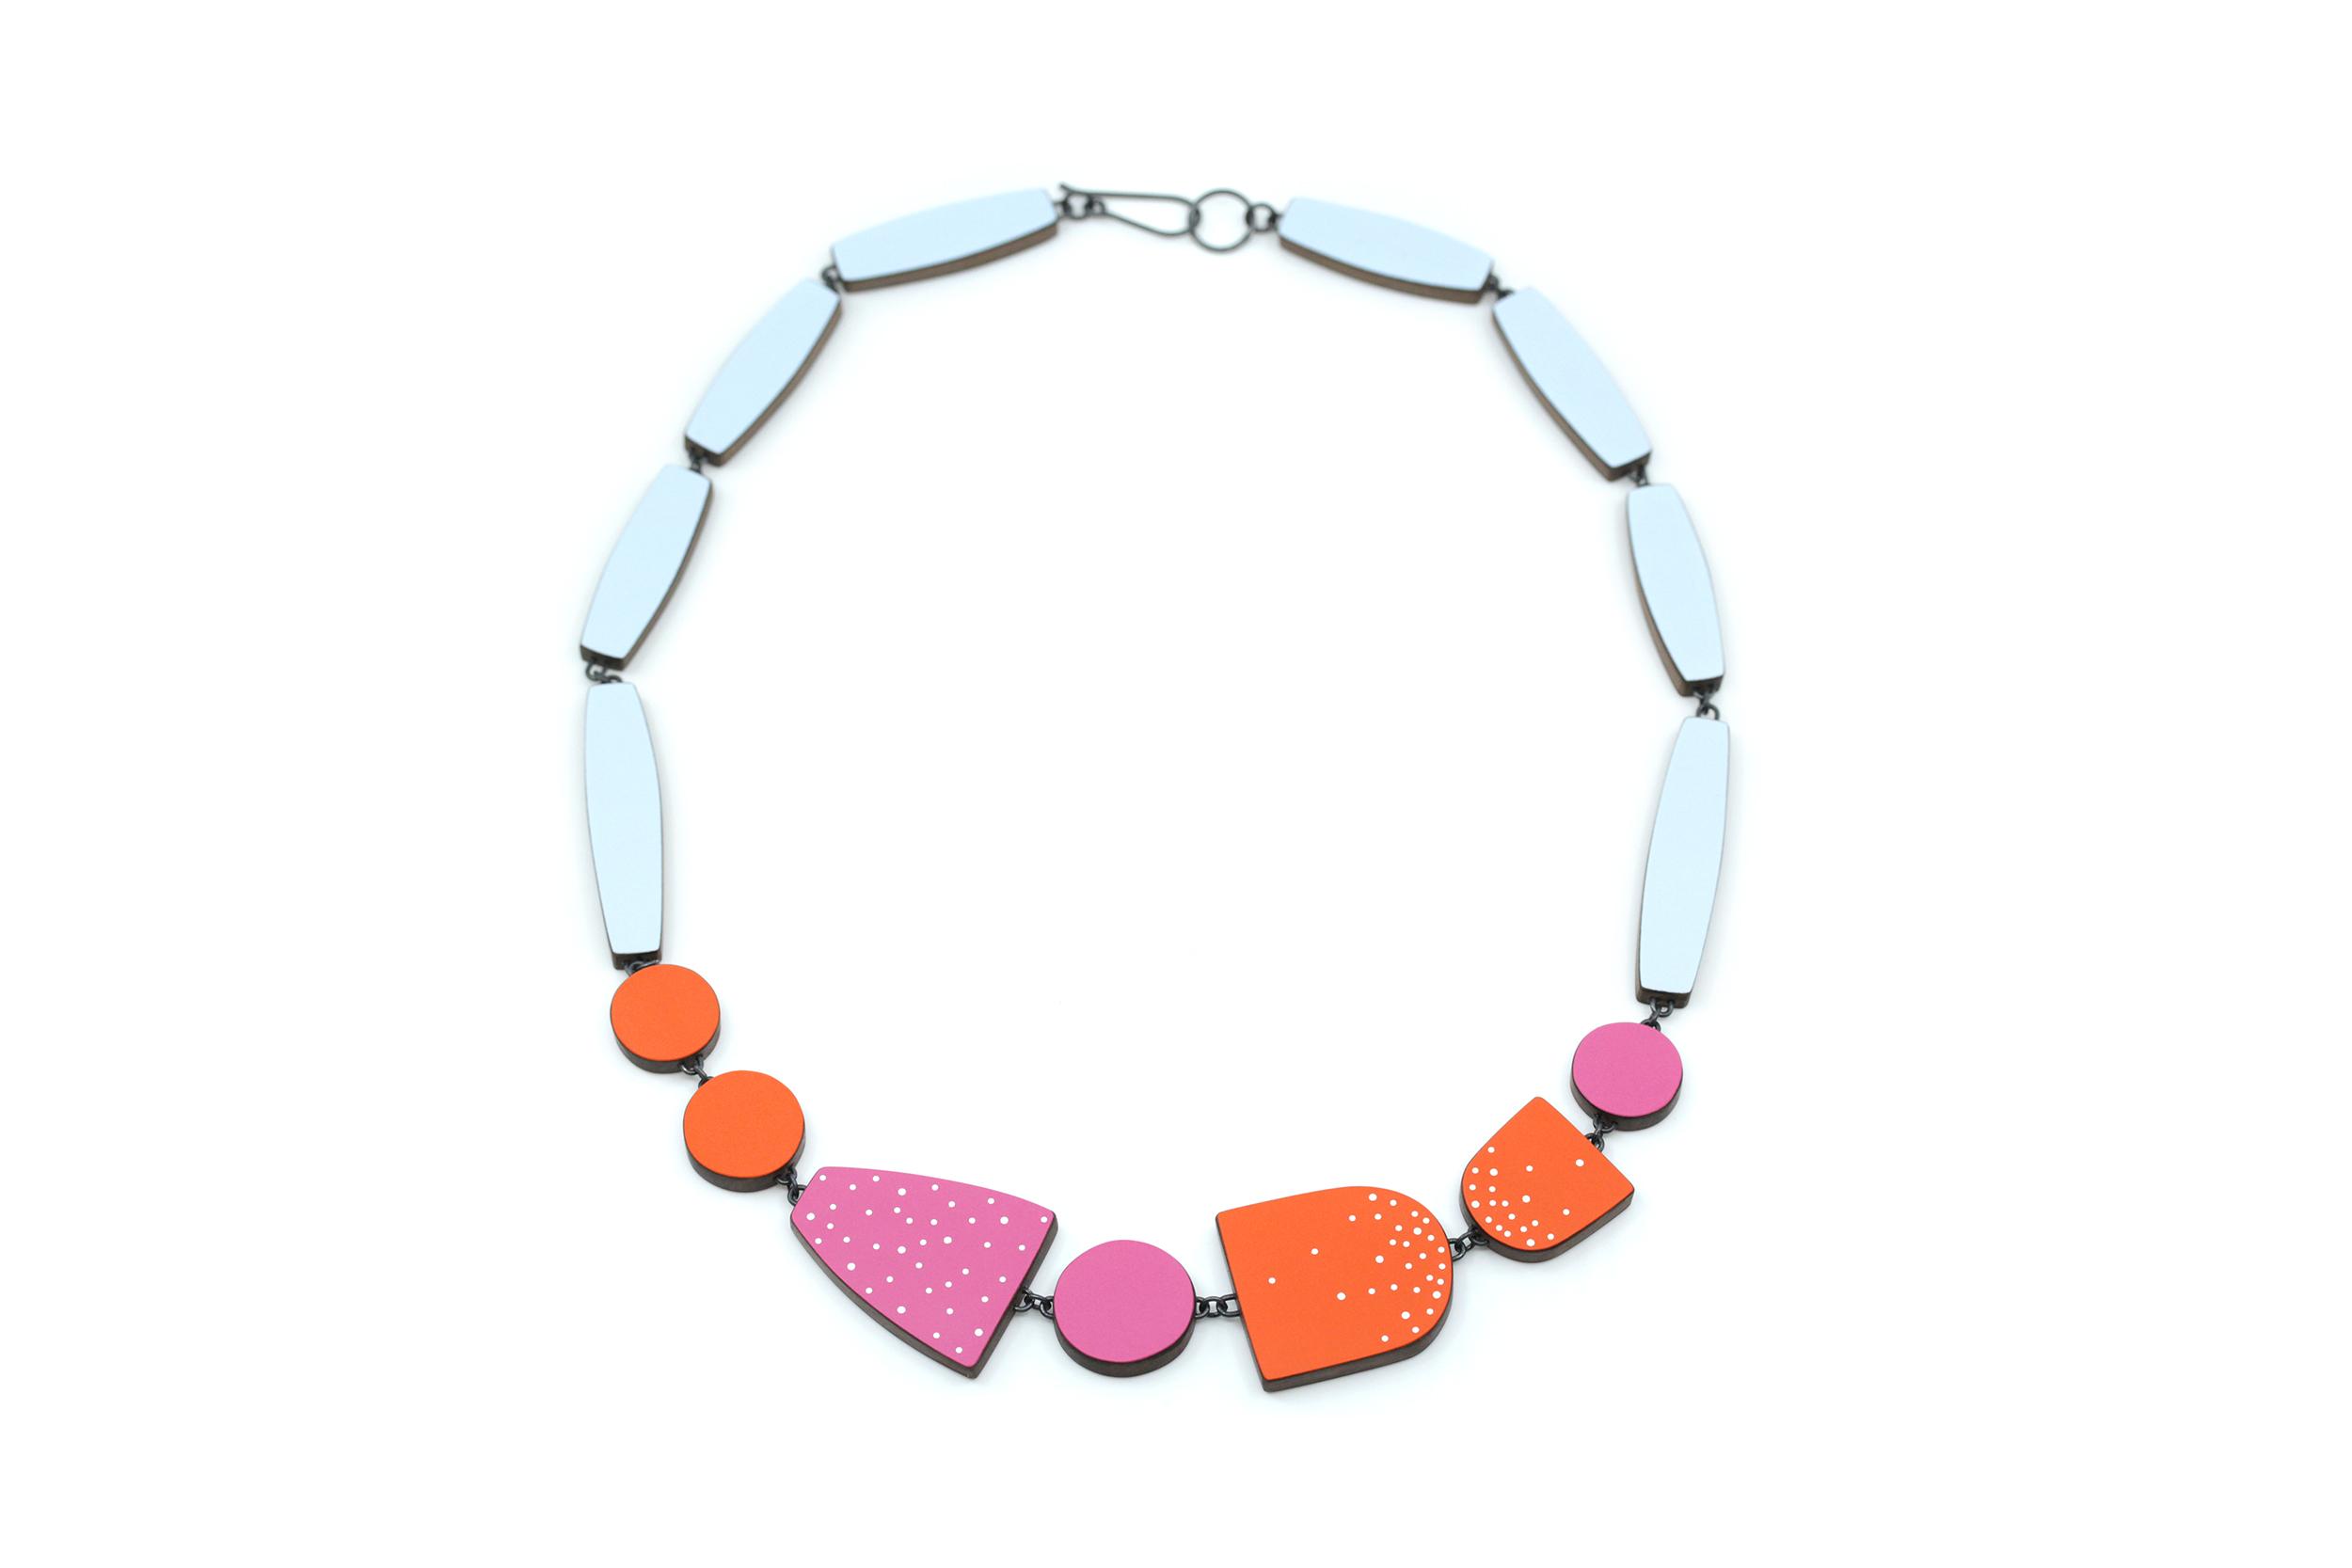 June necklace, 2019